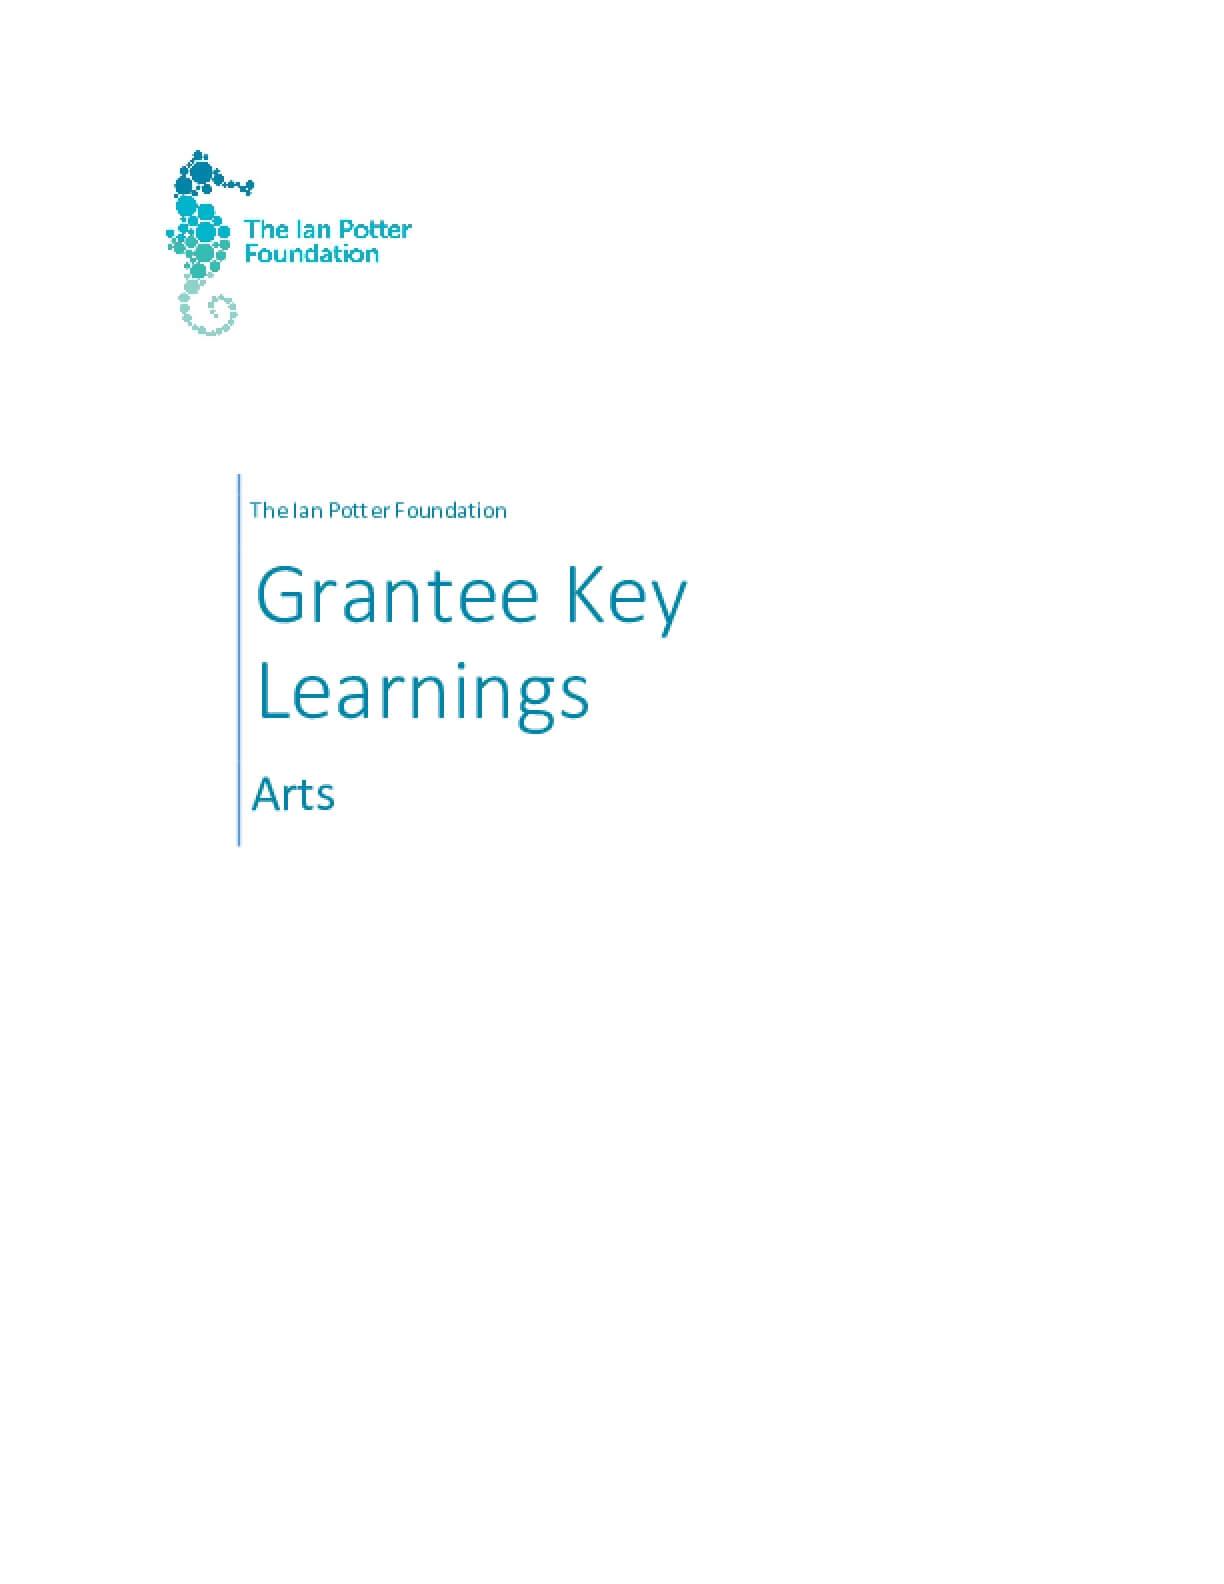 The Ian Potter Foundation Arts Grantee Learnings